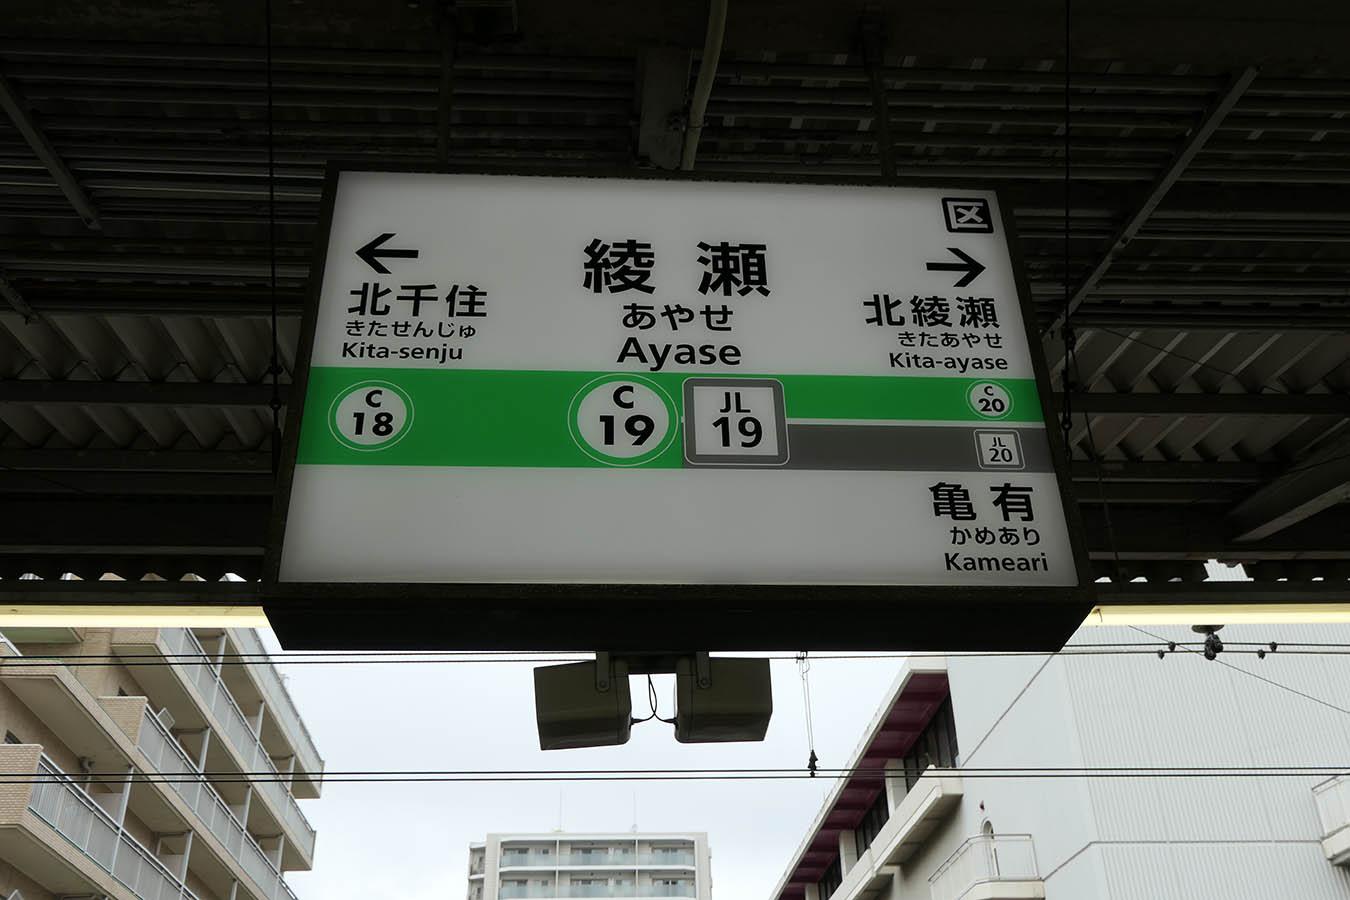 C19_photo04.jpg